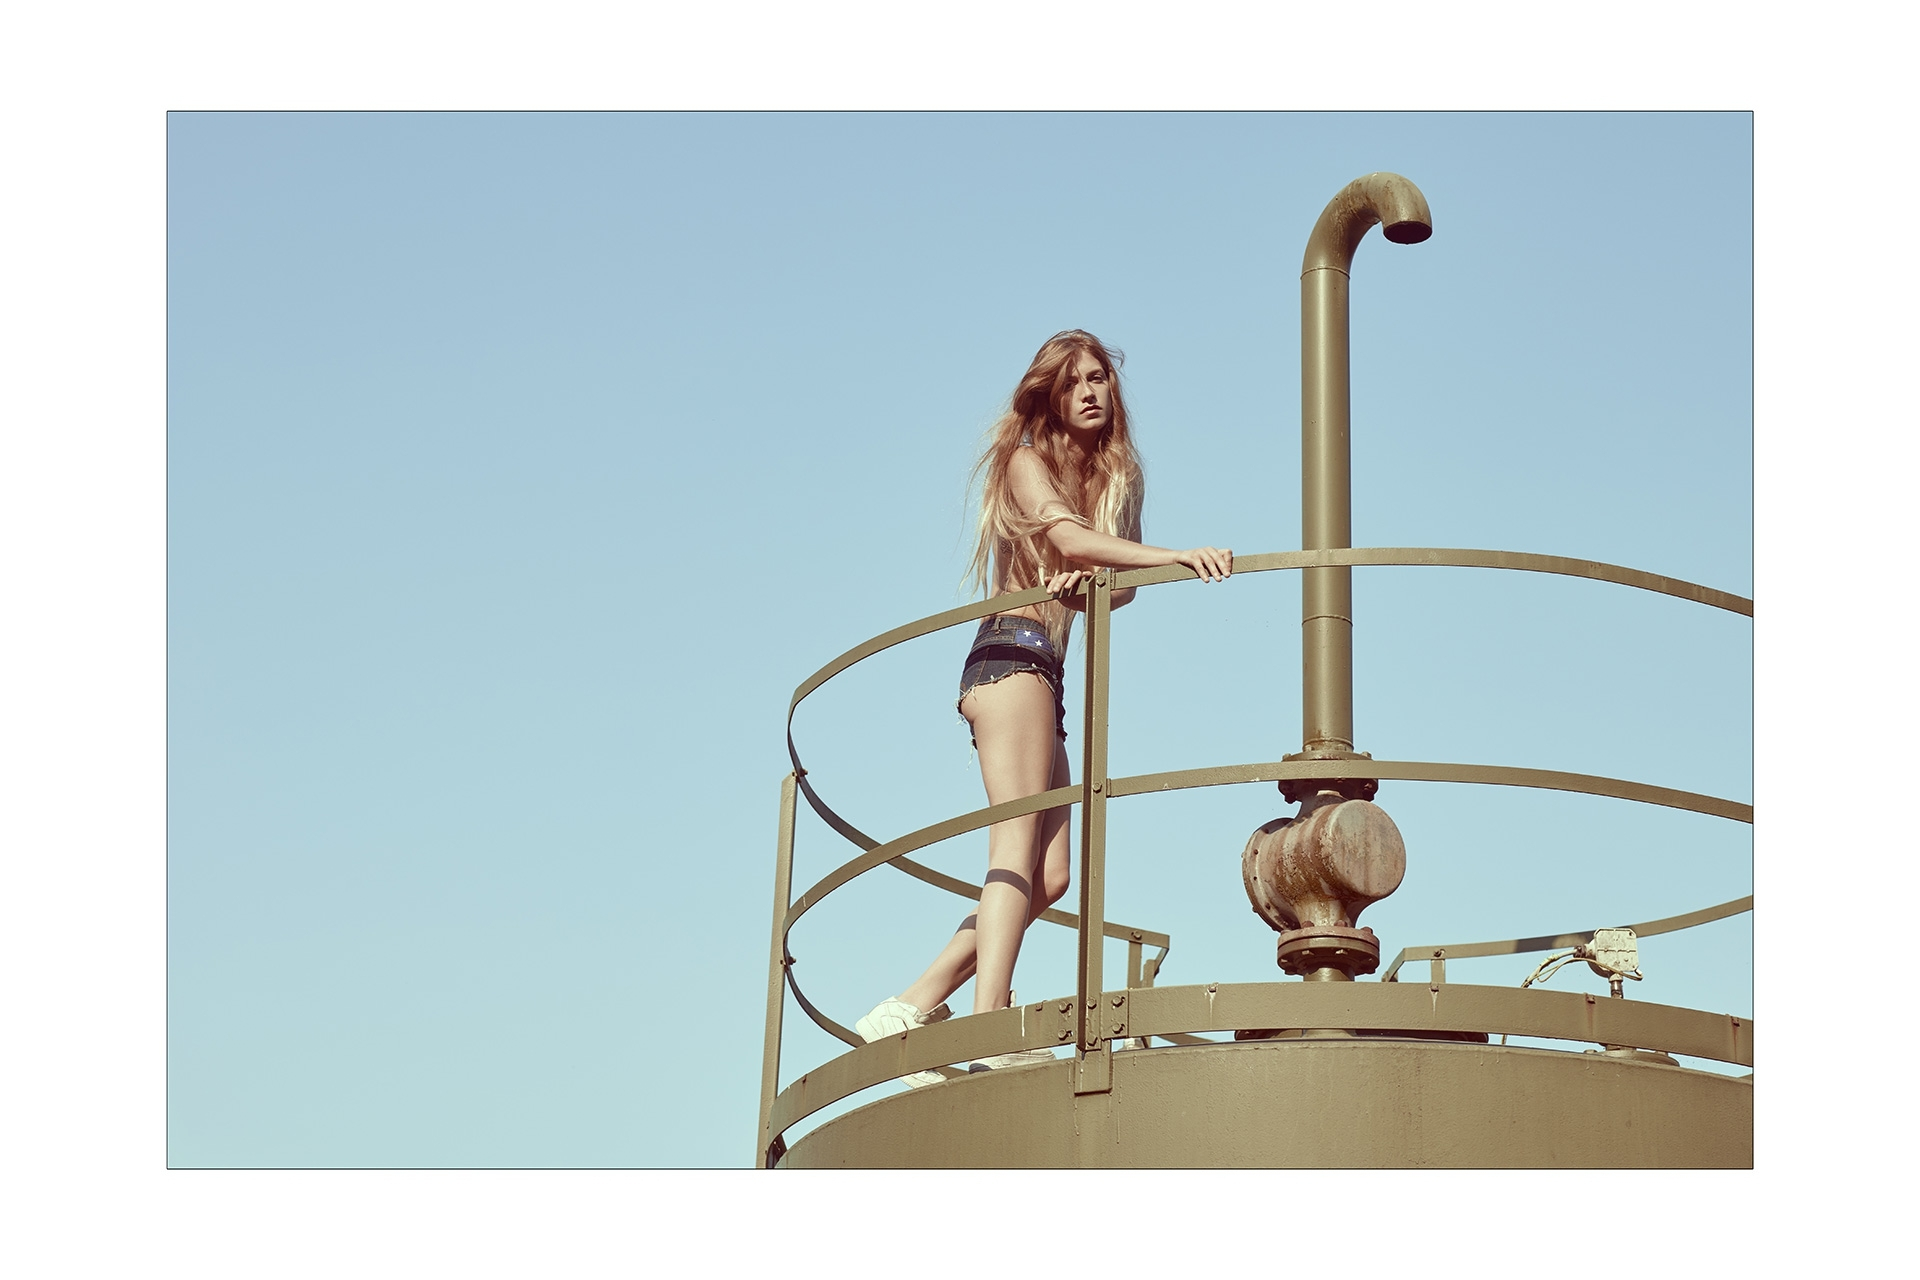 desert petrol drill oil well frederic mercier photographer edito lifestyle us american dream fashion one color